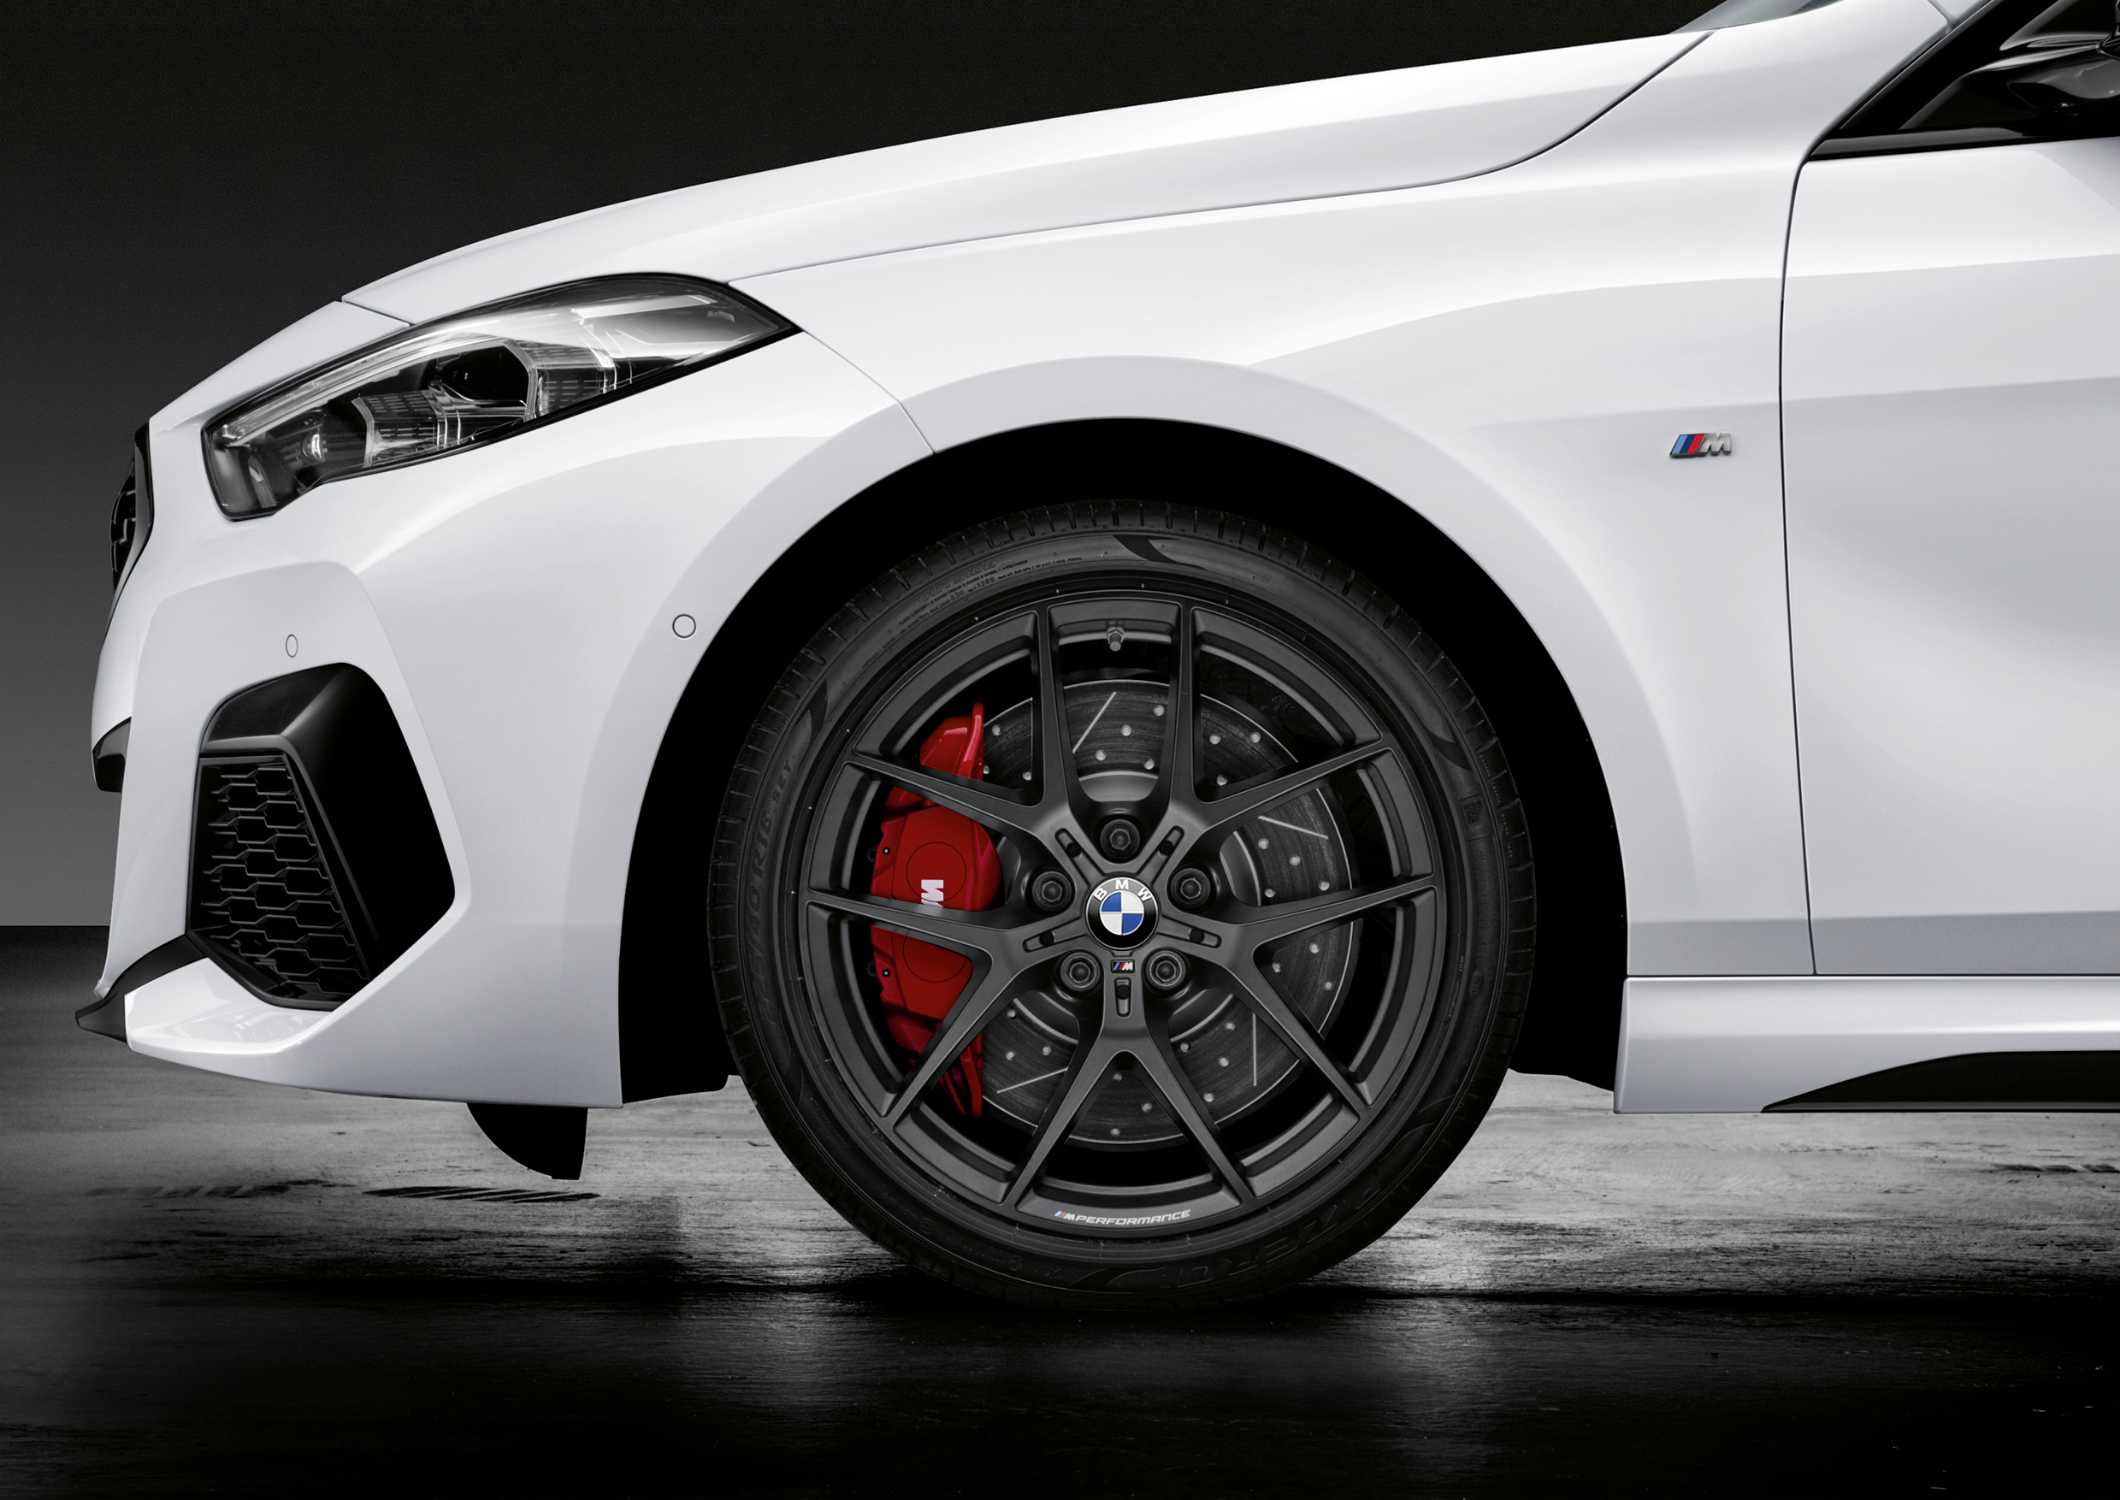 Bmw 2 Series Gran Coupe 18 Inch M Performance Forged Wheel V Spoke 554 M Jet Black Matt M Performance 18 Inch Brake System 10 2019